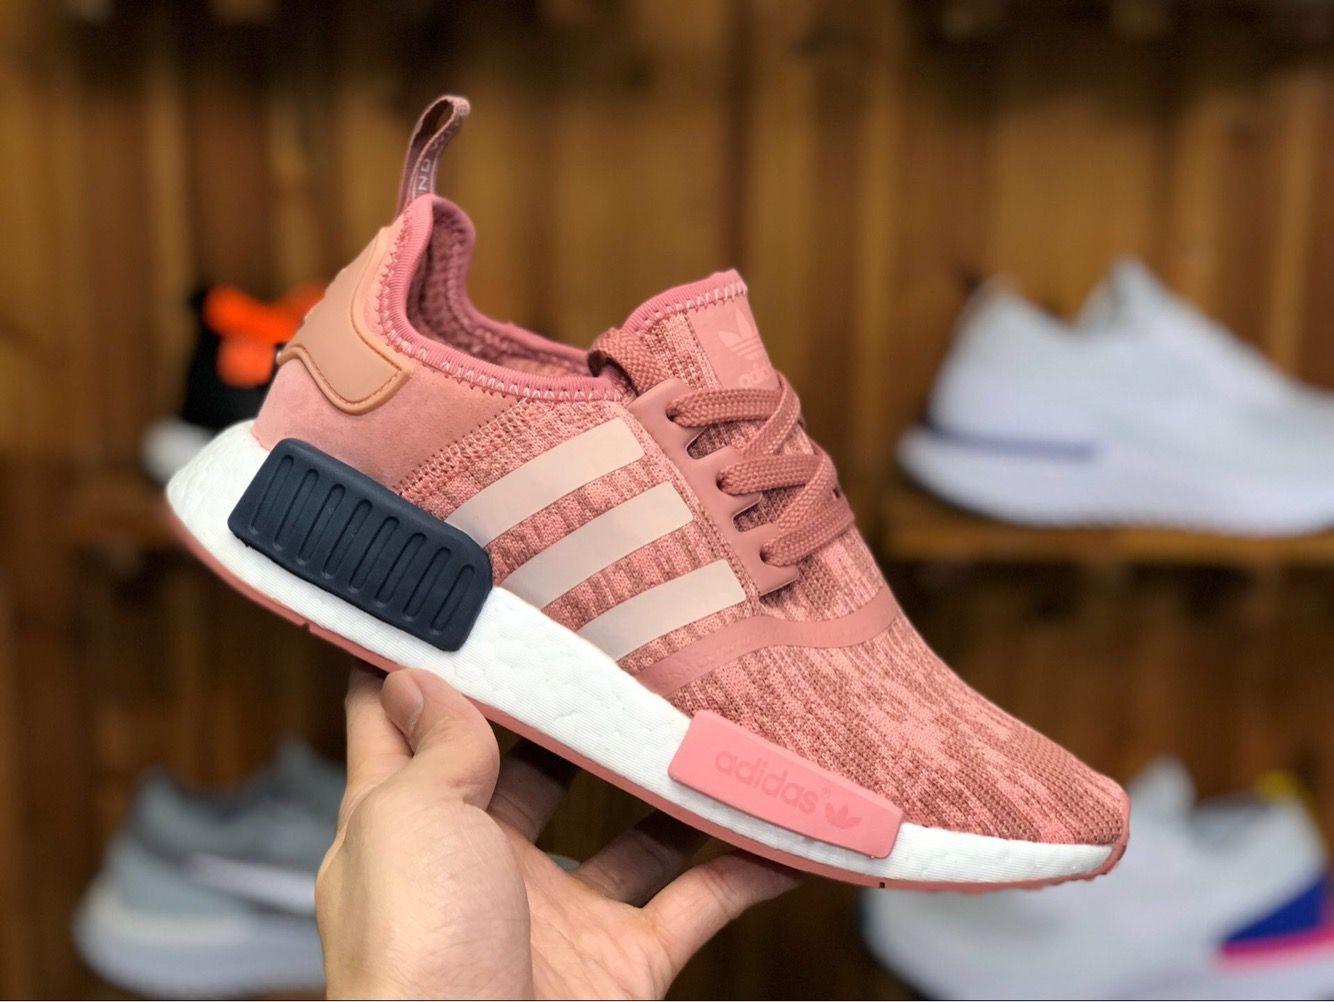 bbcb97067 65 Adidas Originals NMD R1 Primeknit Raw Pink Sneakers